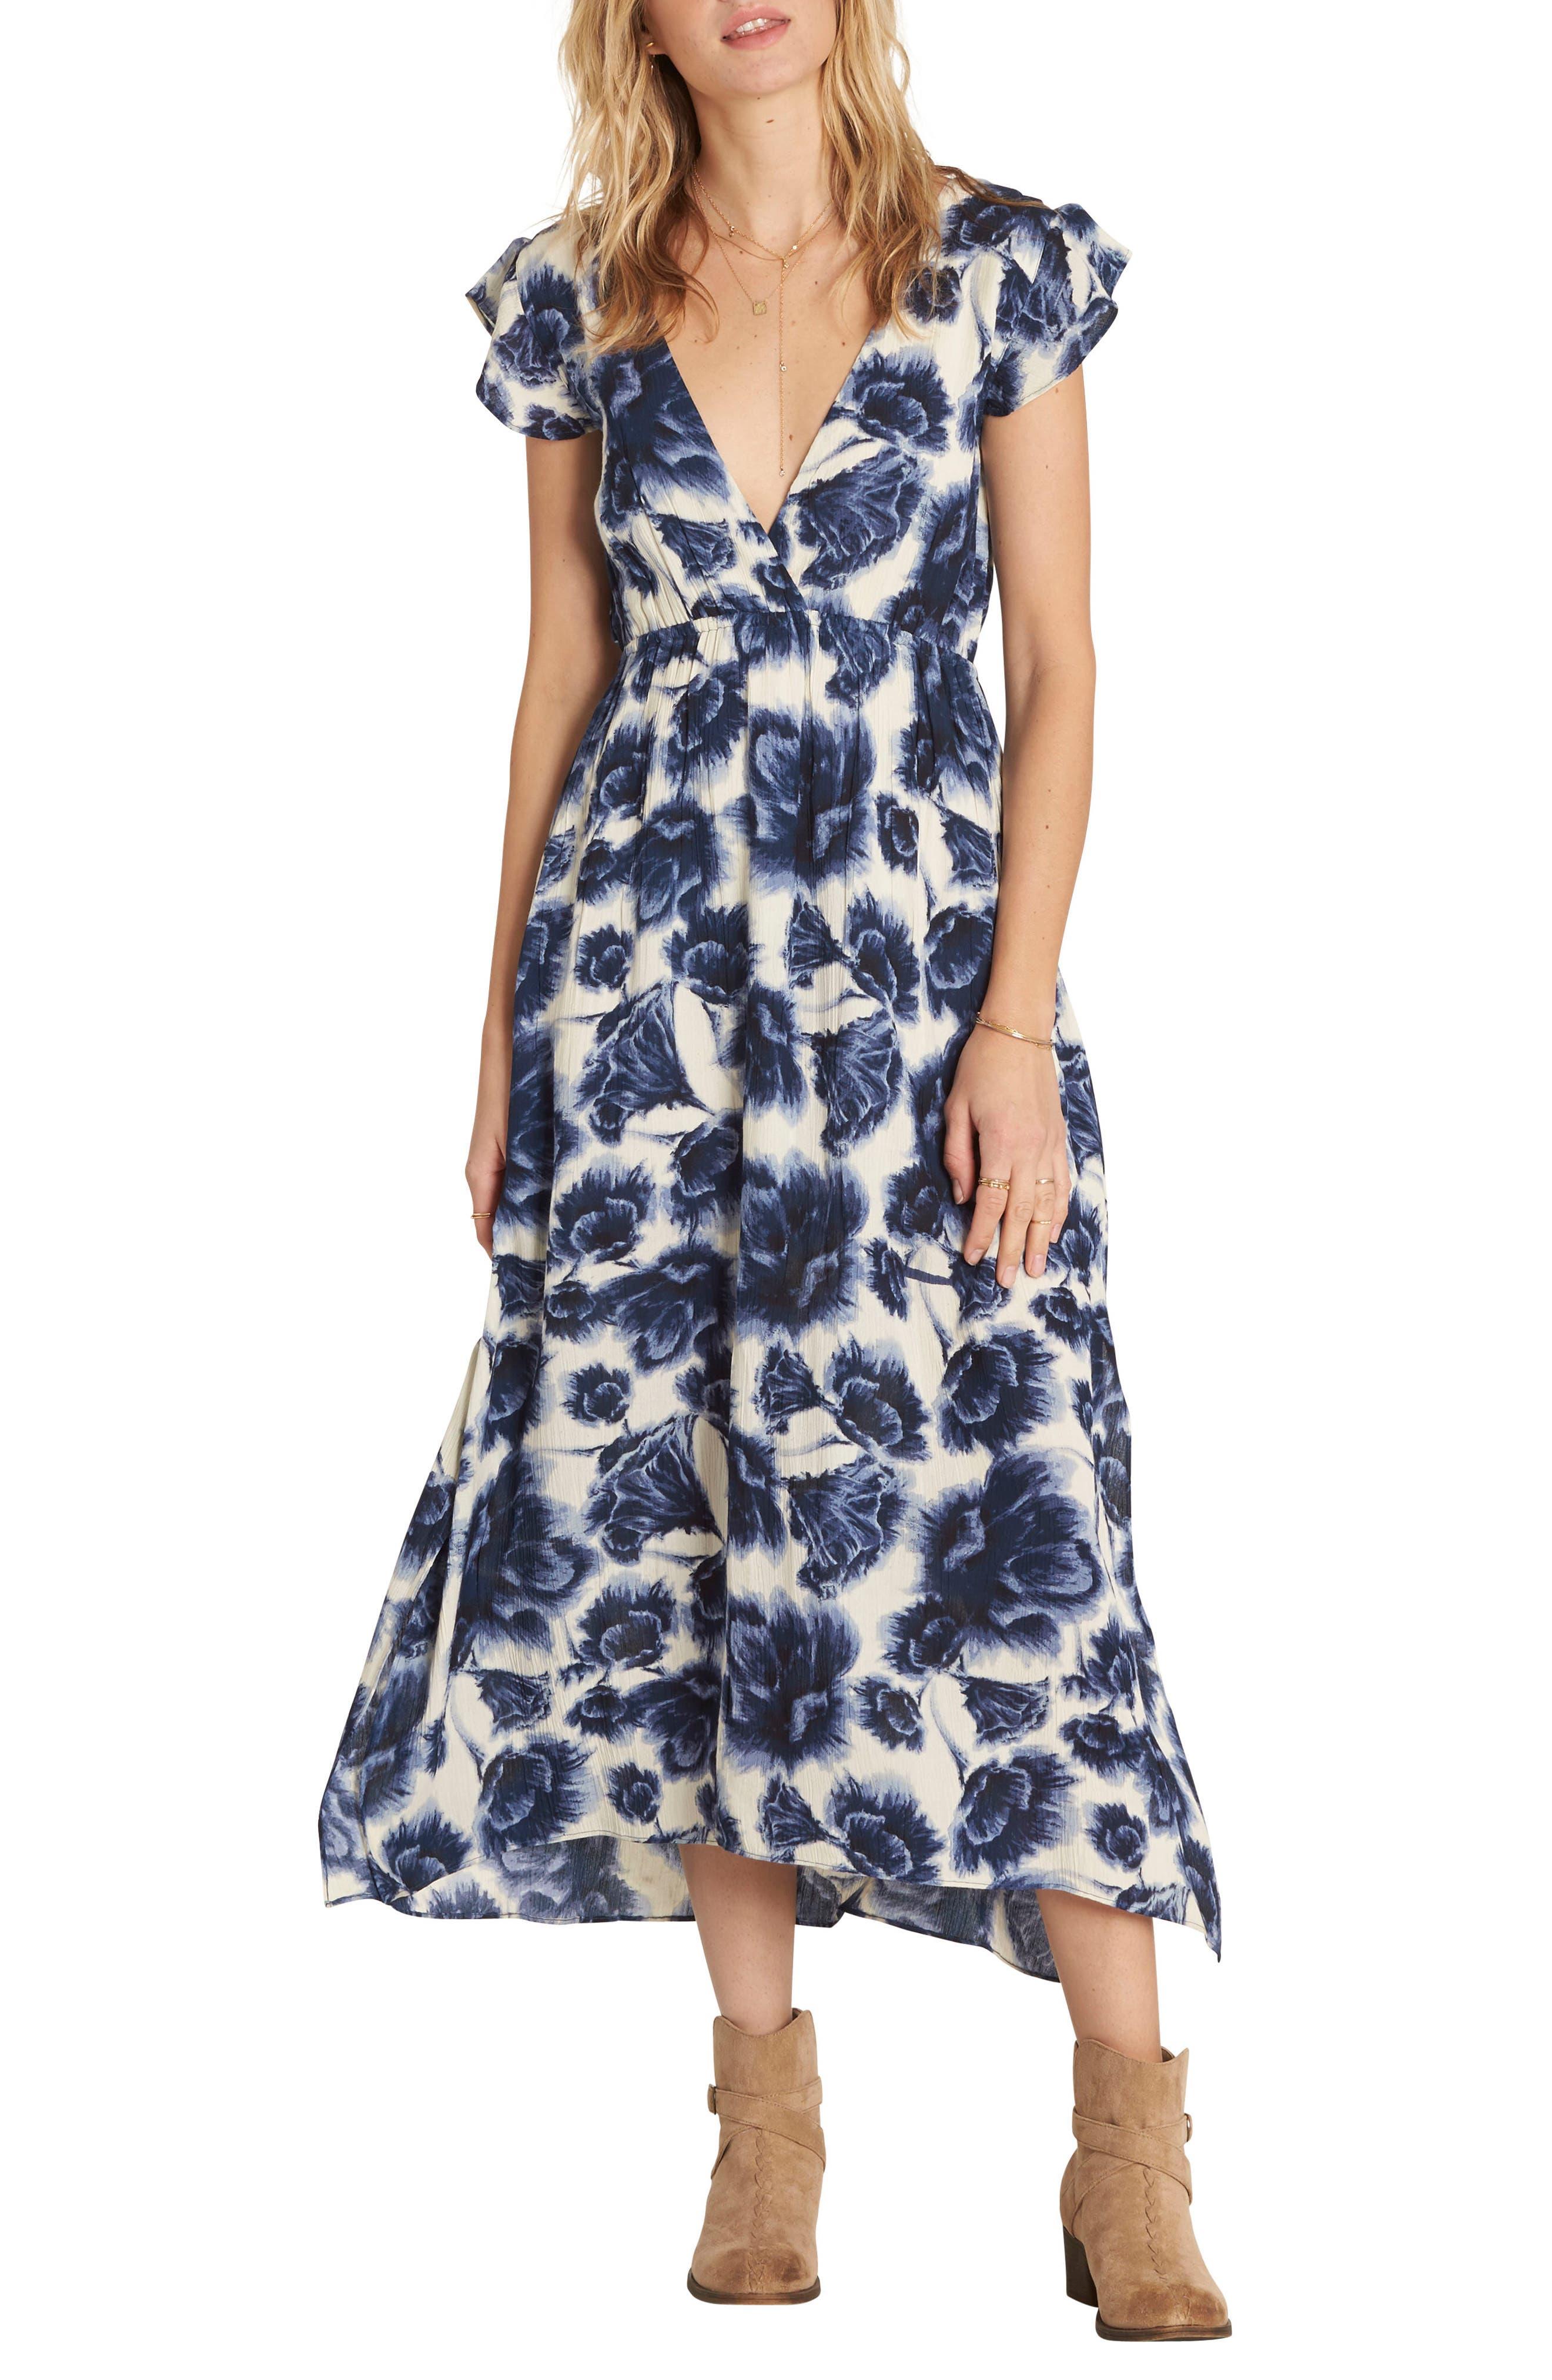 Billabong Don't Mess Floral Print Dress